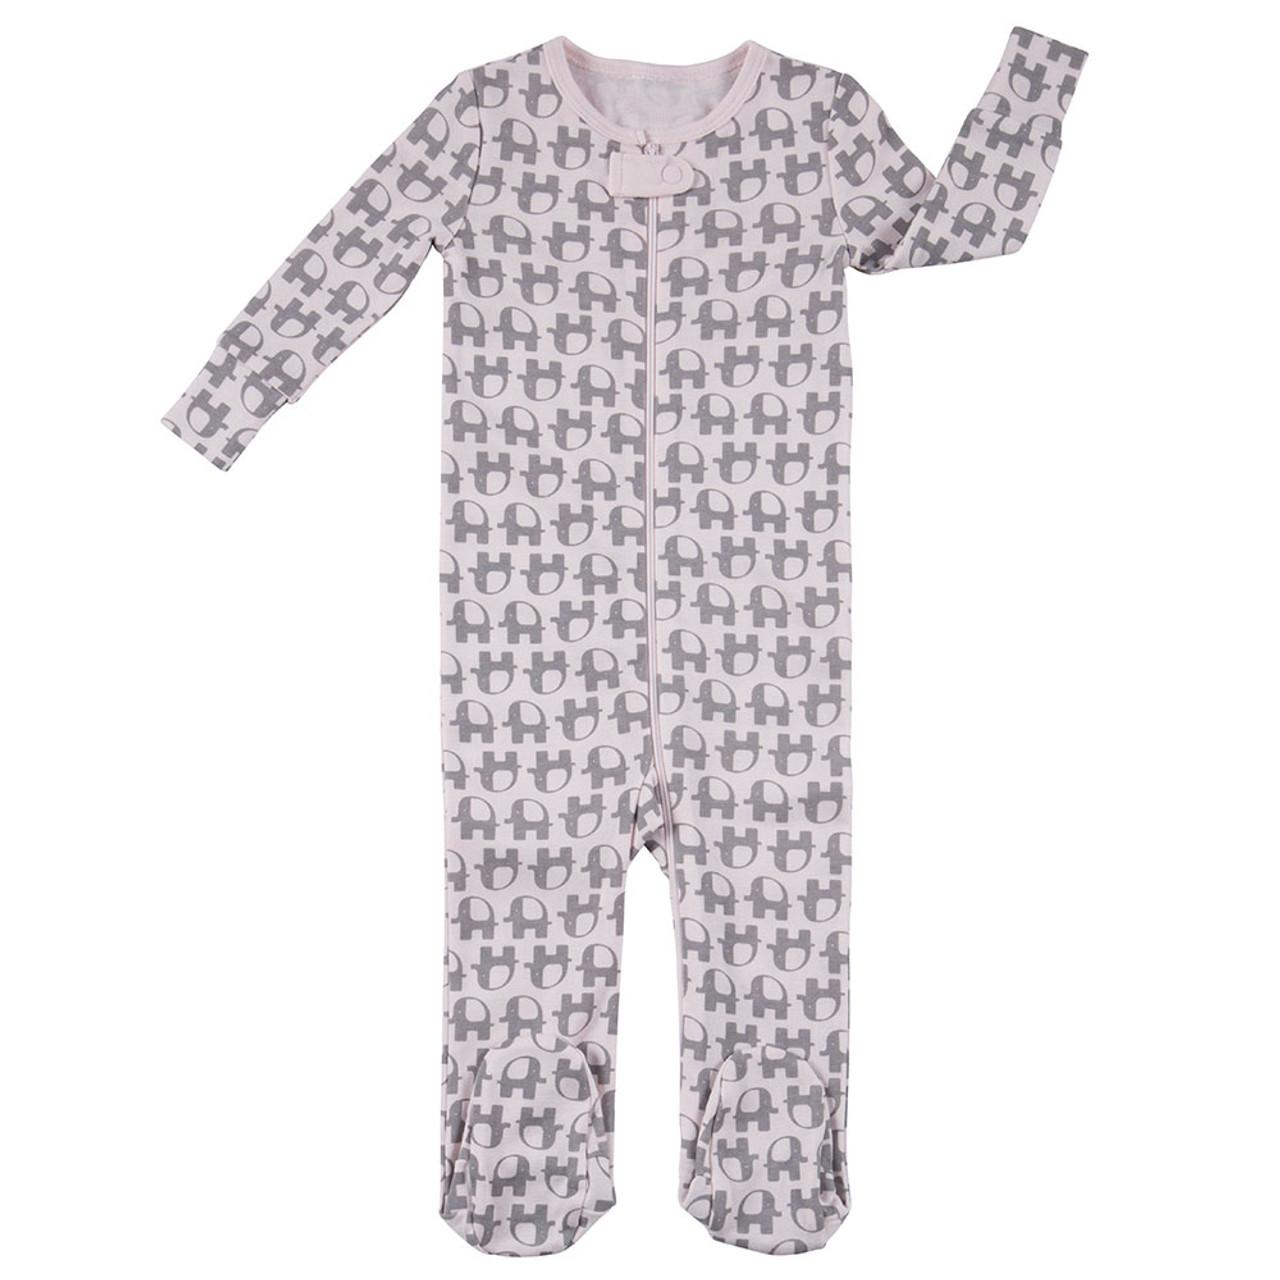 8a9ebd9fea16 Little Peanut Footed Sleepwear